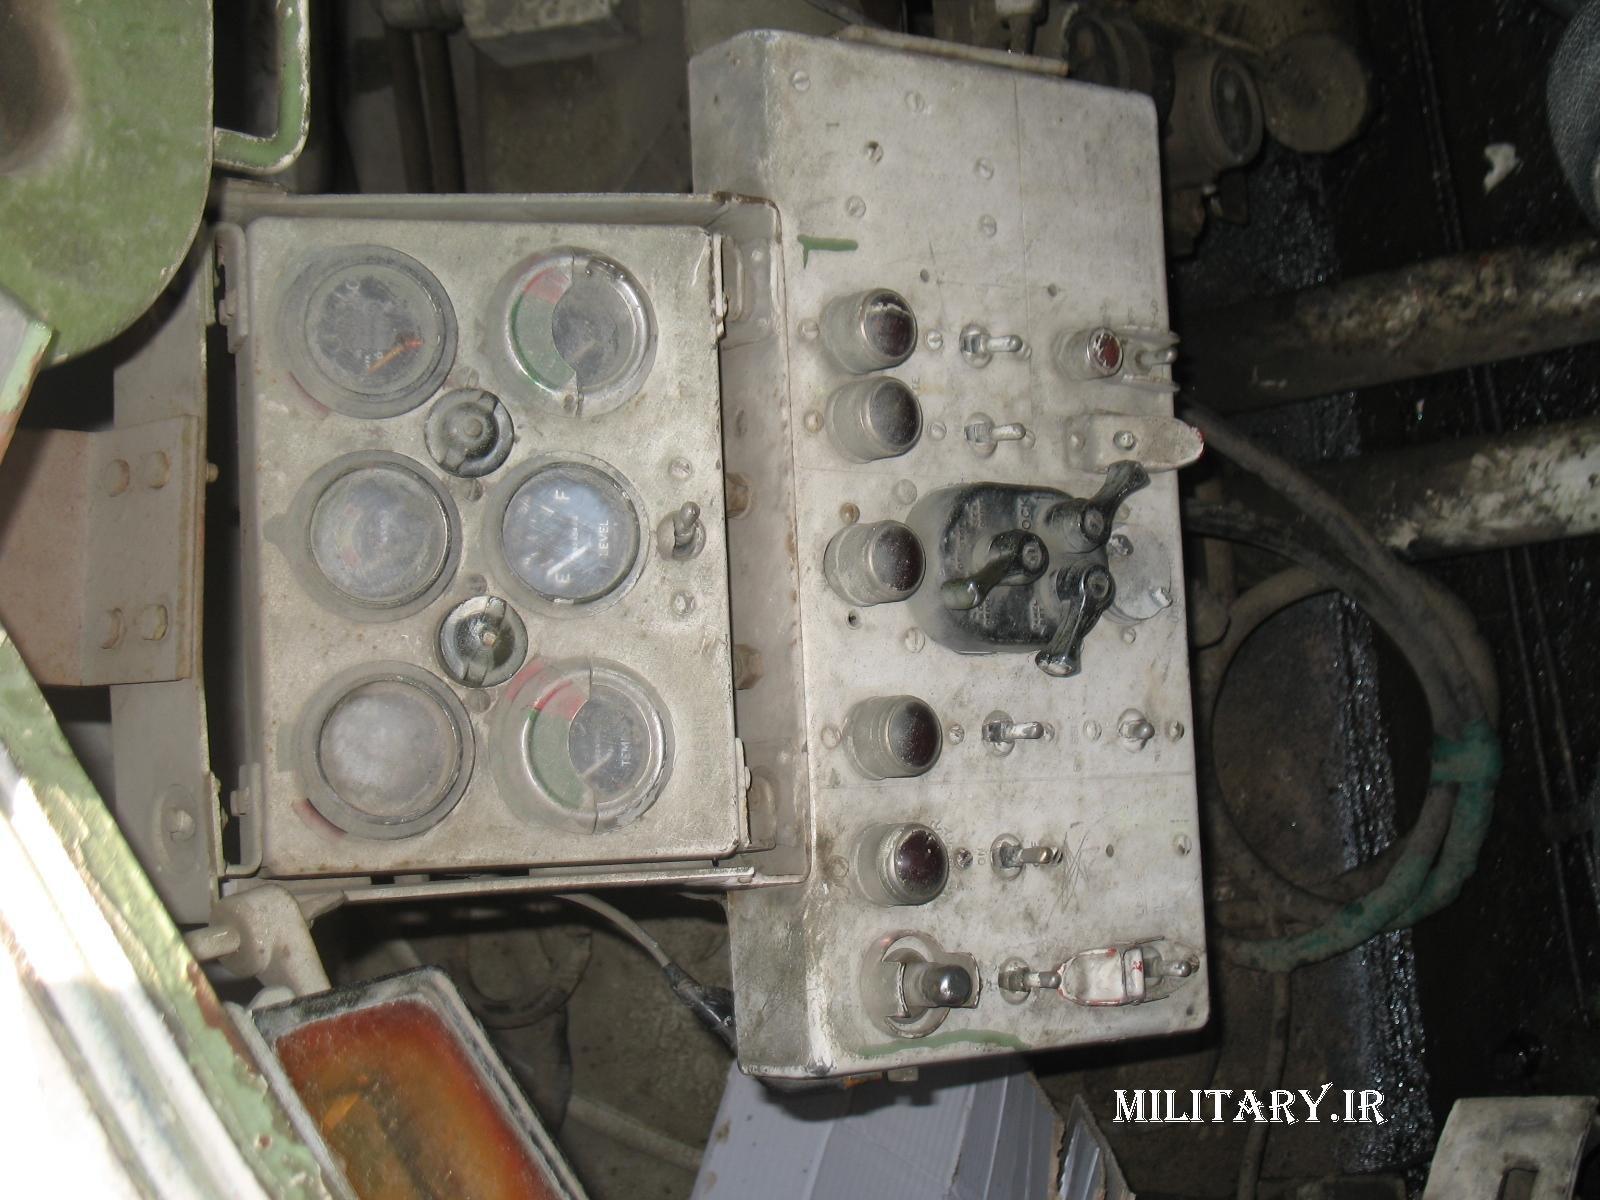 http://gallery.military.ir/albums/userpics/Zulfiqar1_%287%29.JPG